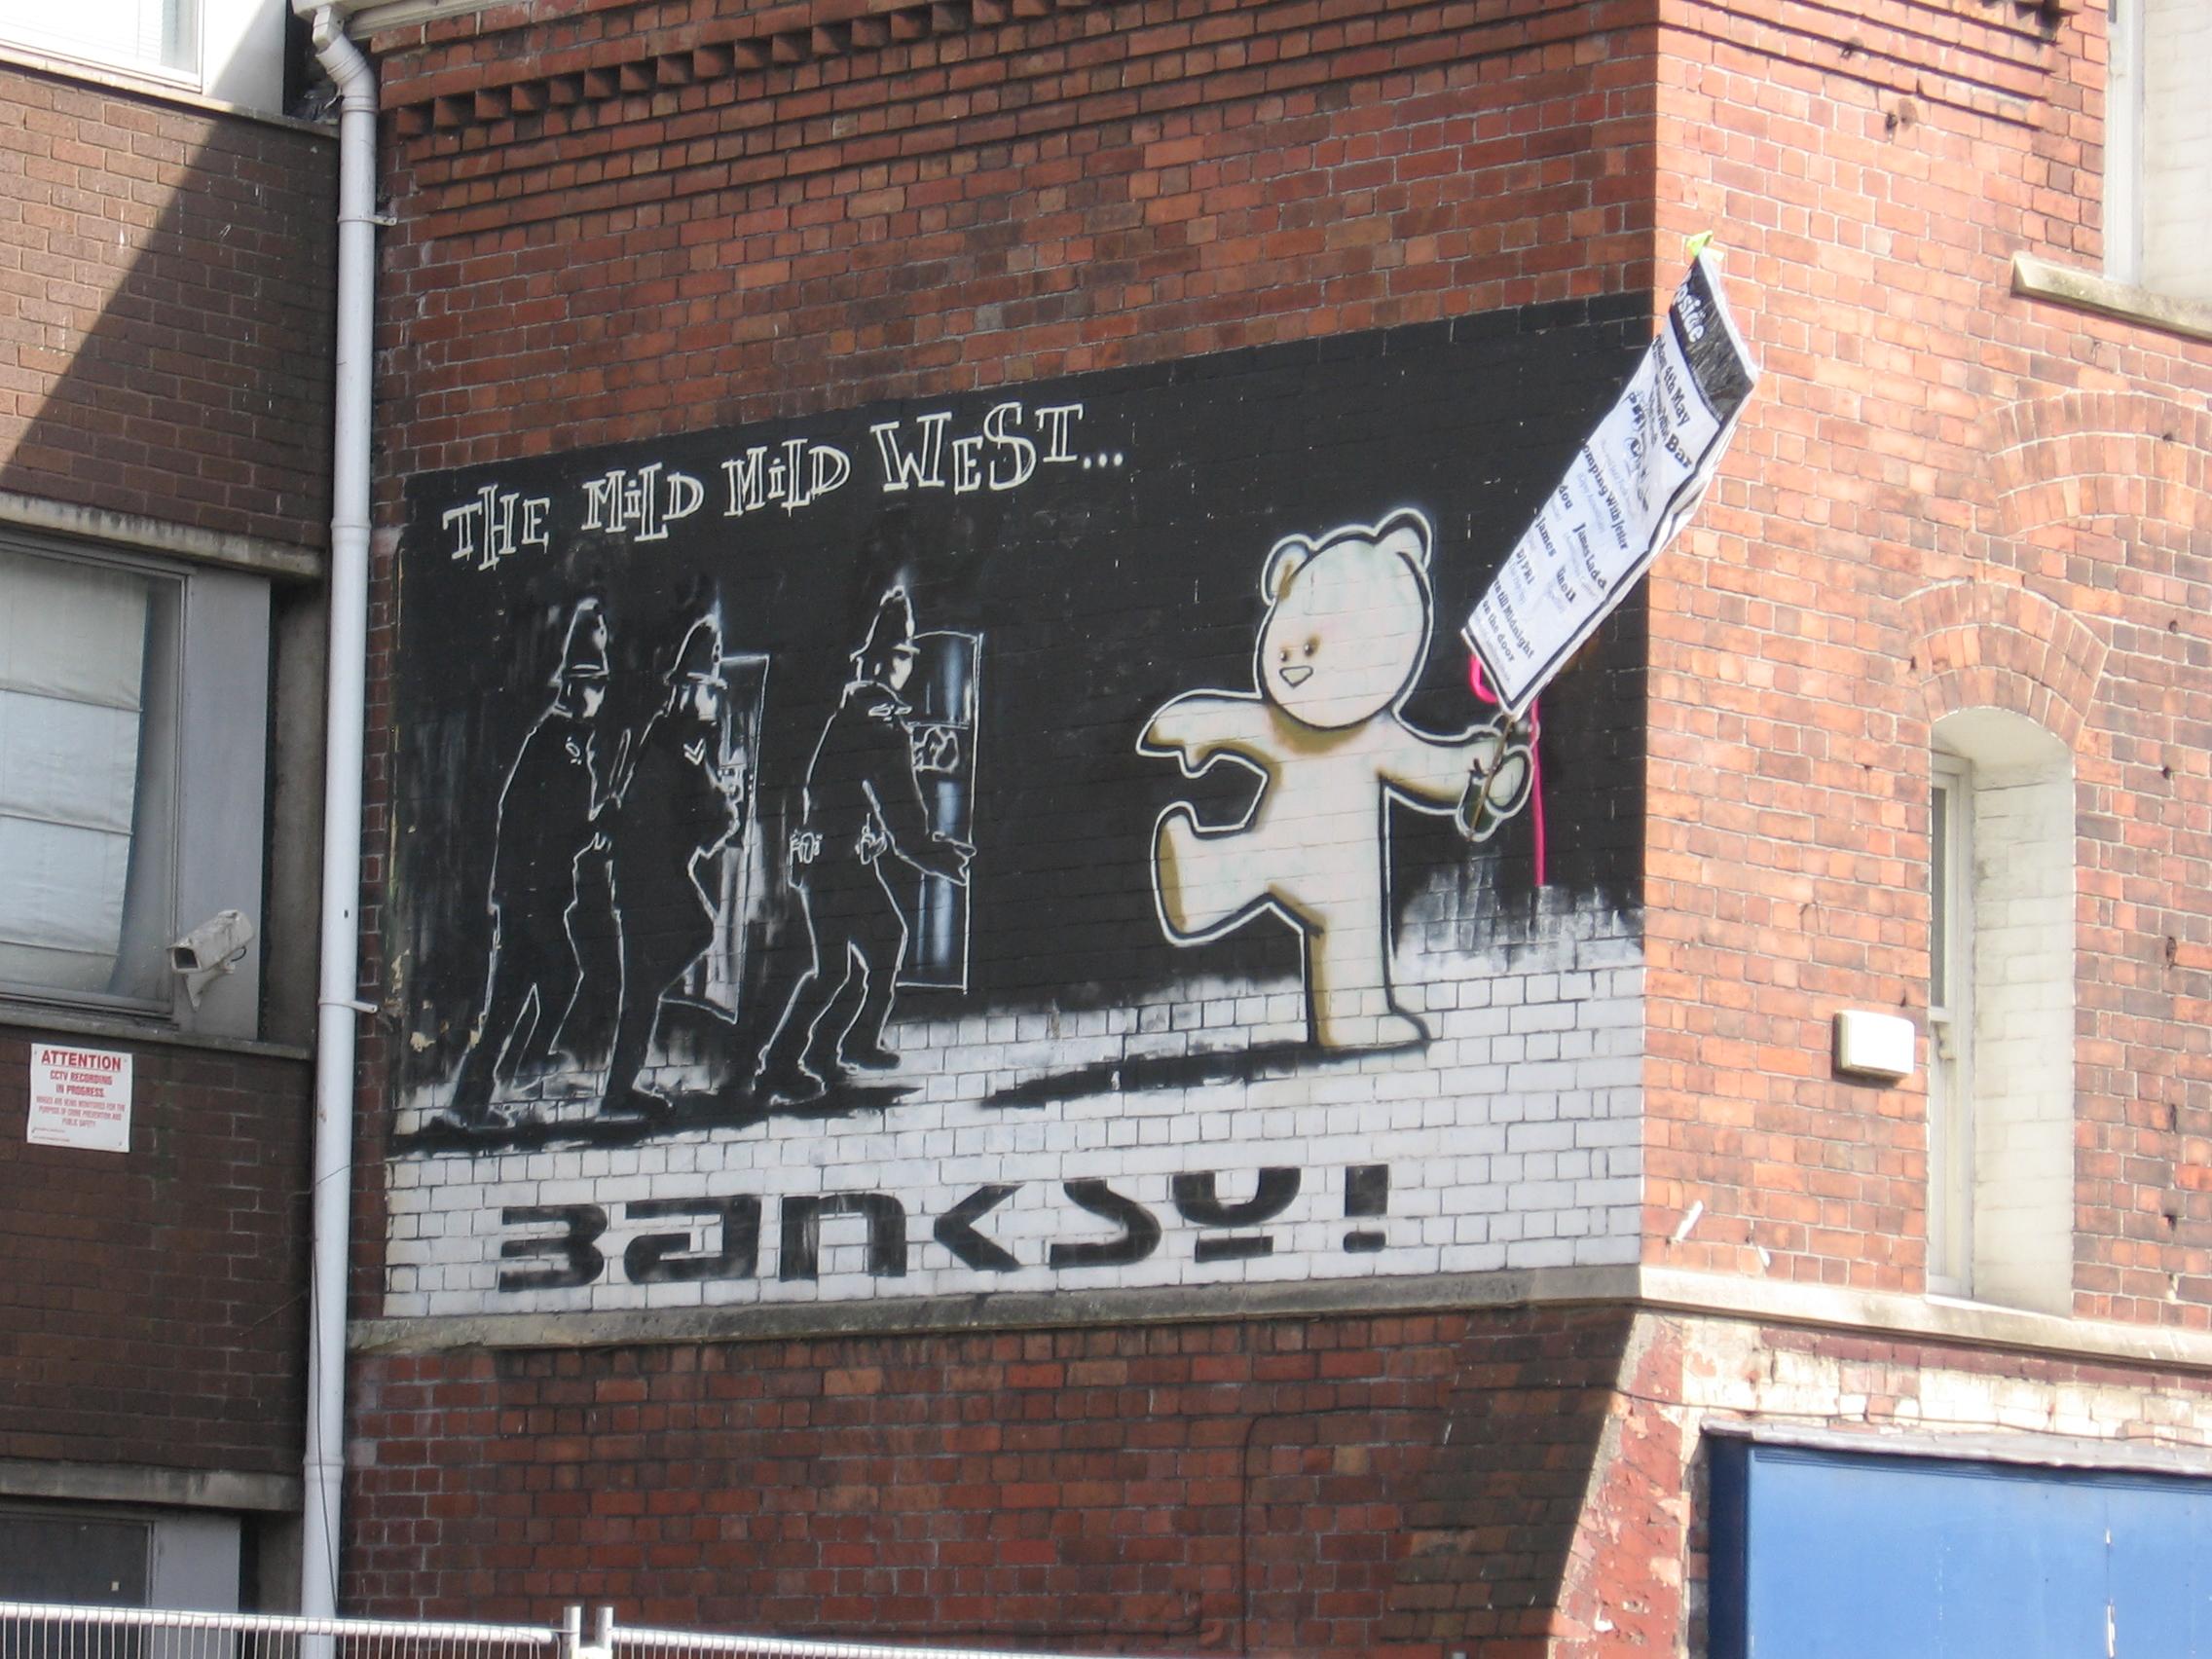 Banksy_MIld_Mild_West_and_poster